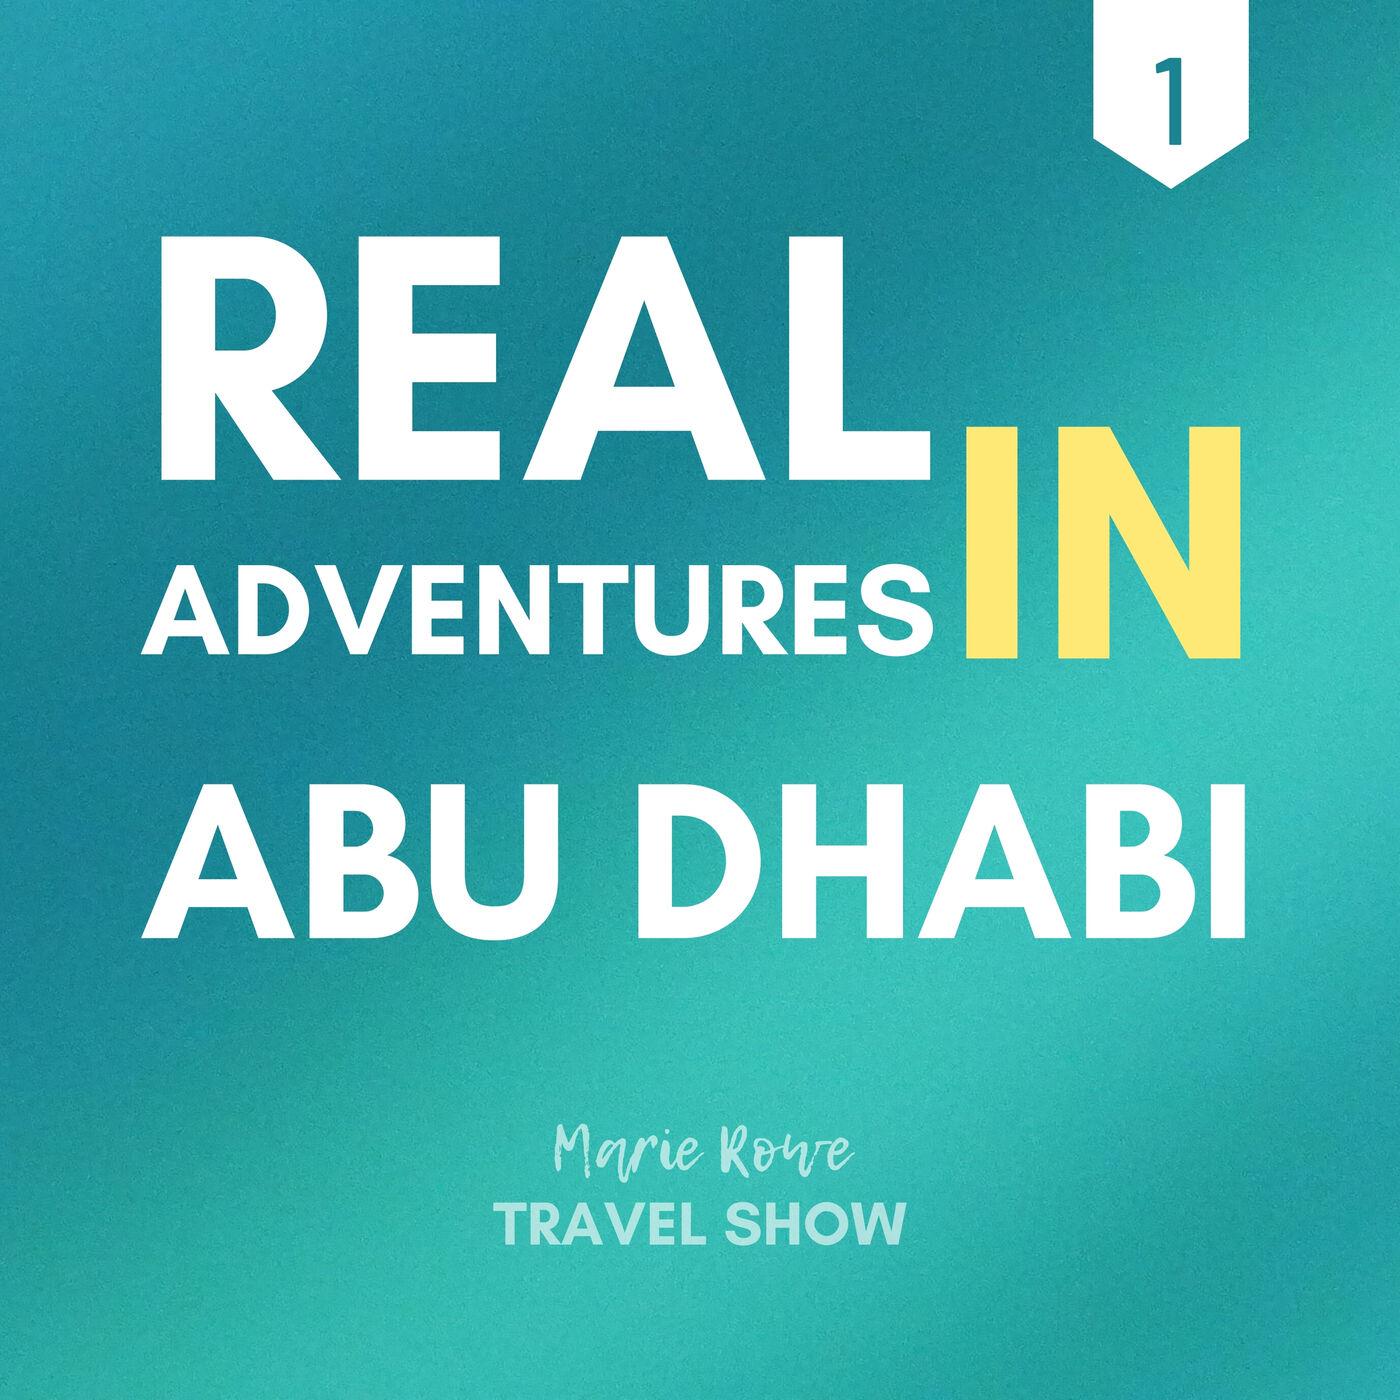 DUNE BASHING IN THE DESERT: ADVENTURES IN ABU DHABI